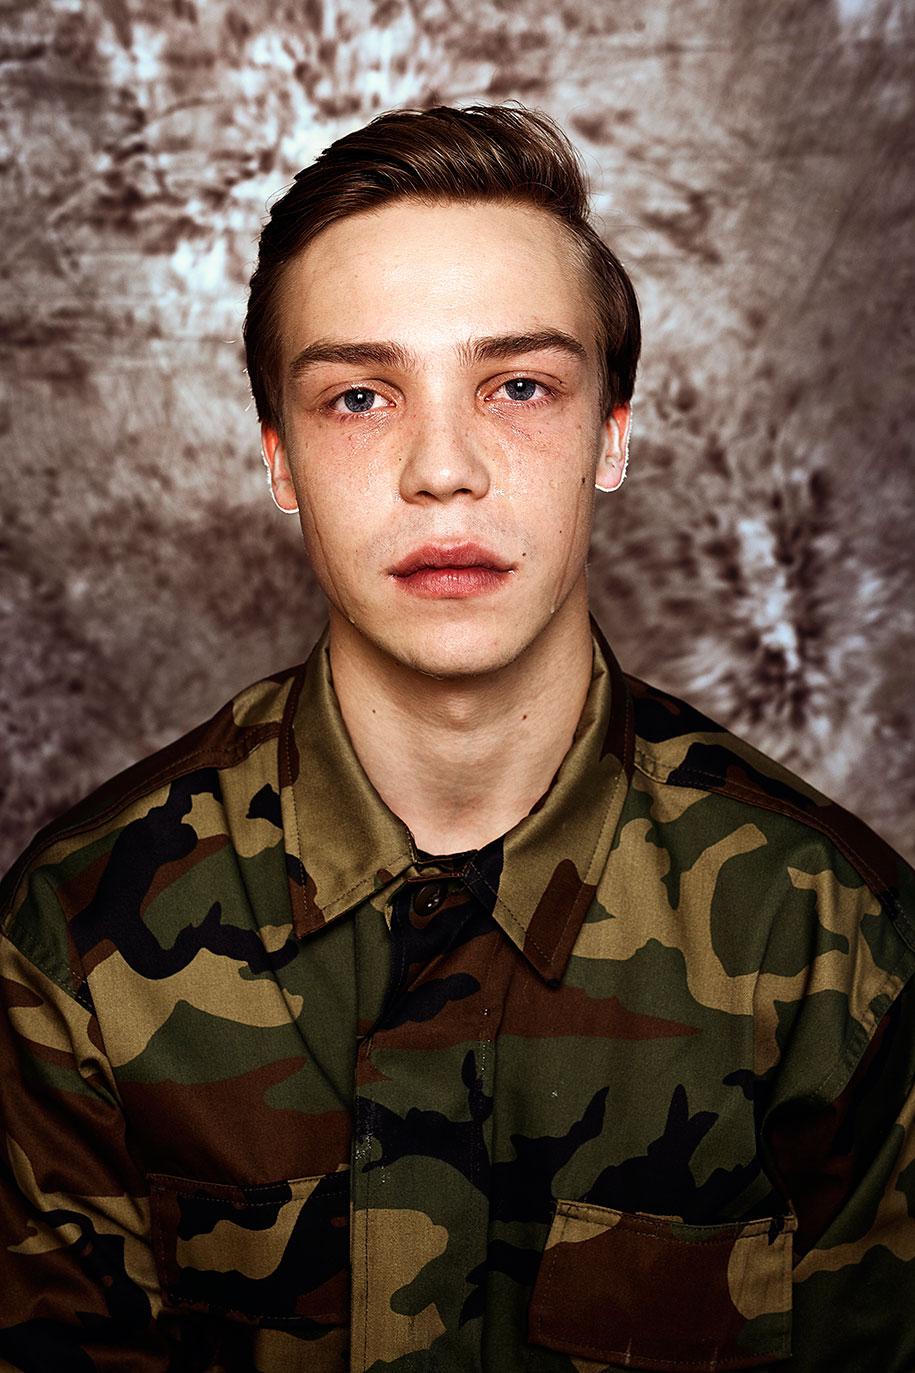 lithuanian-draft-conscription-men-portraits-neringa-rekasiute-beata-tiskevic-hasanova-11